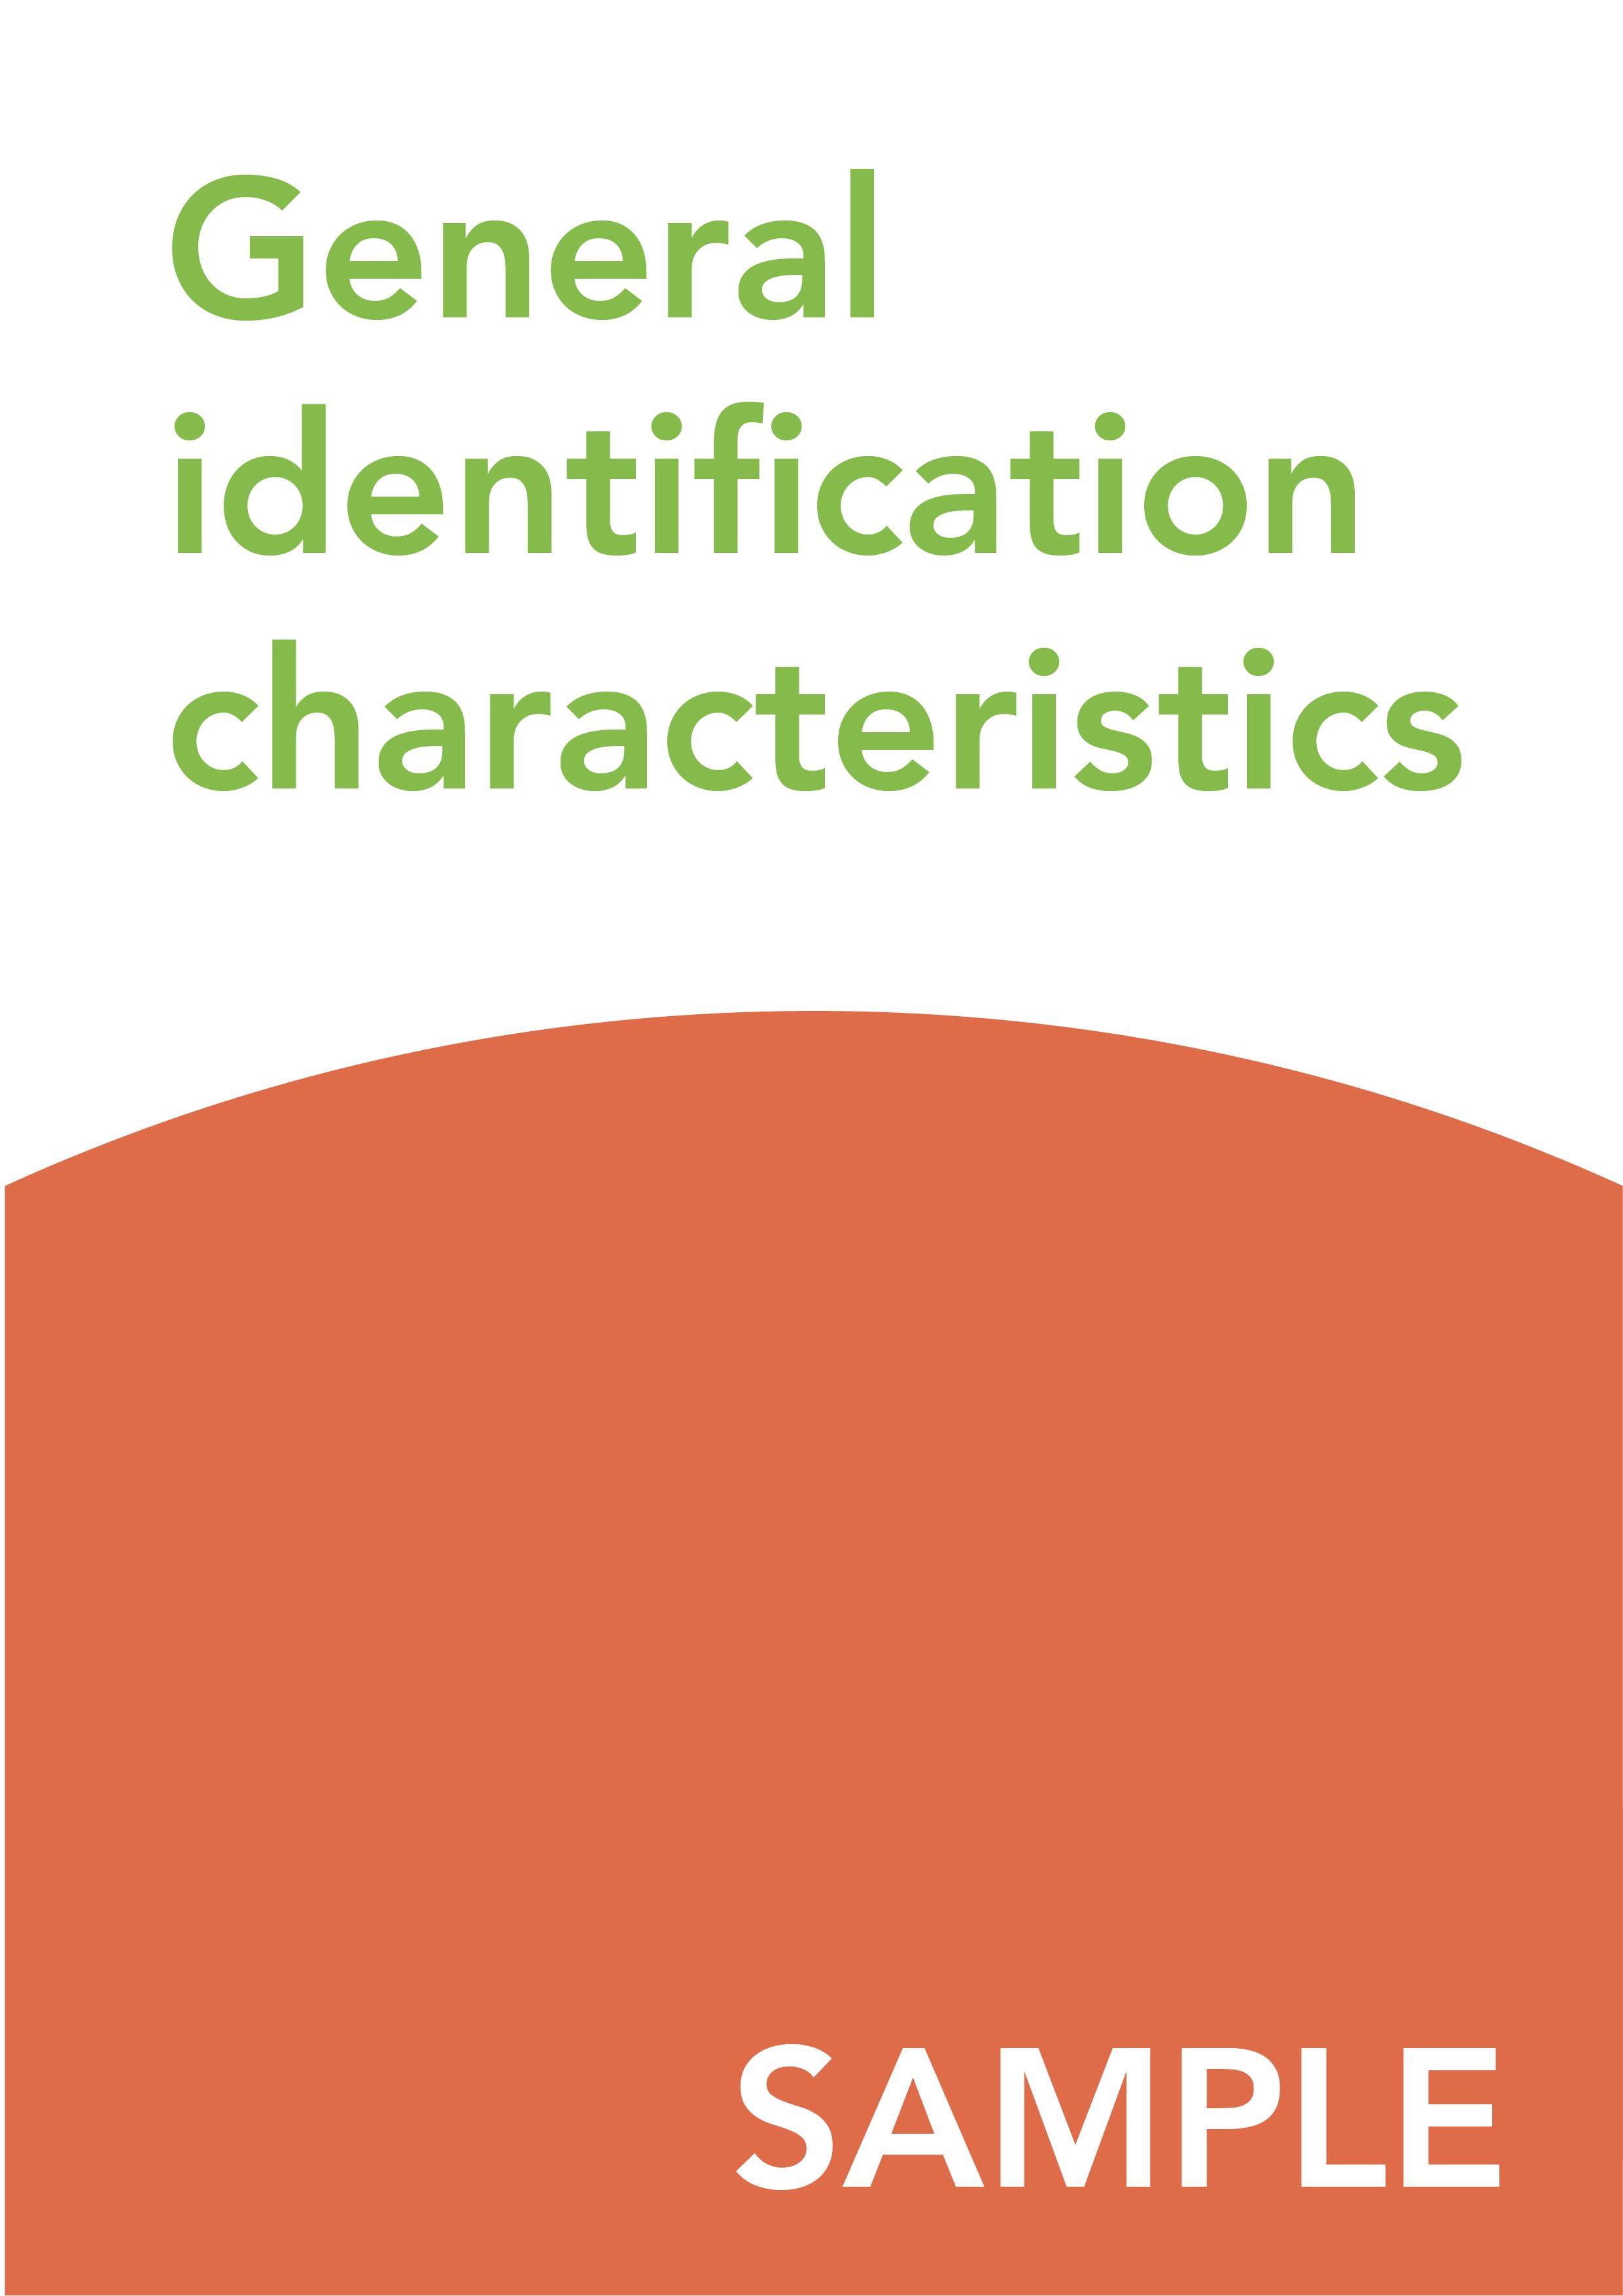 General identification characteristics